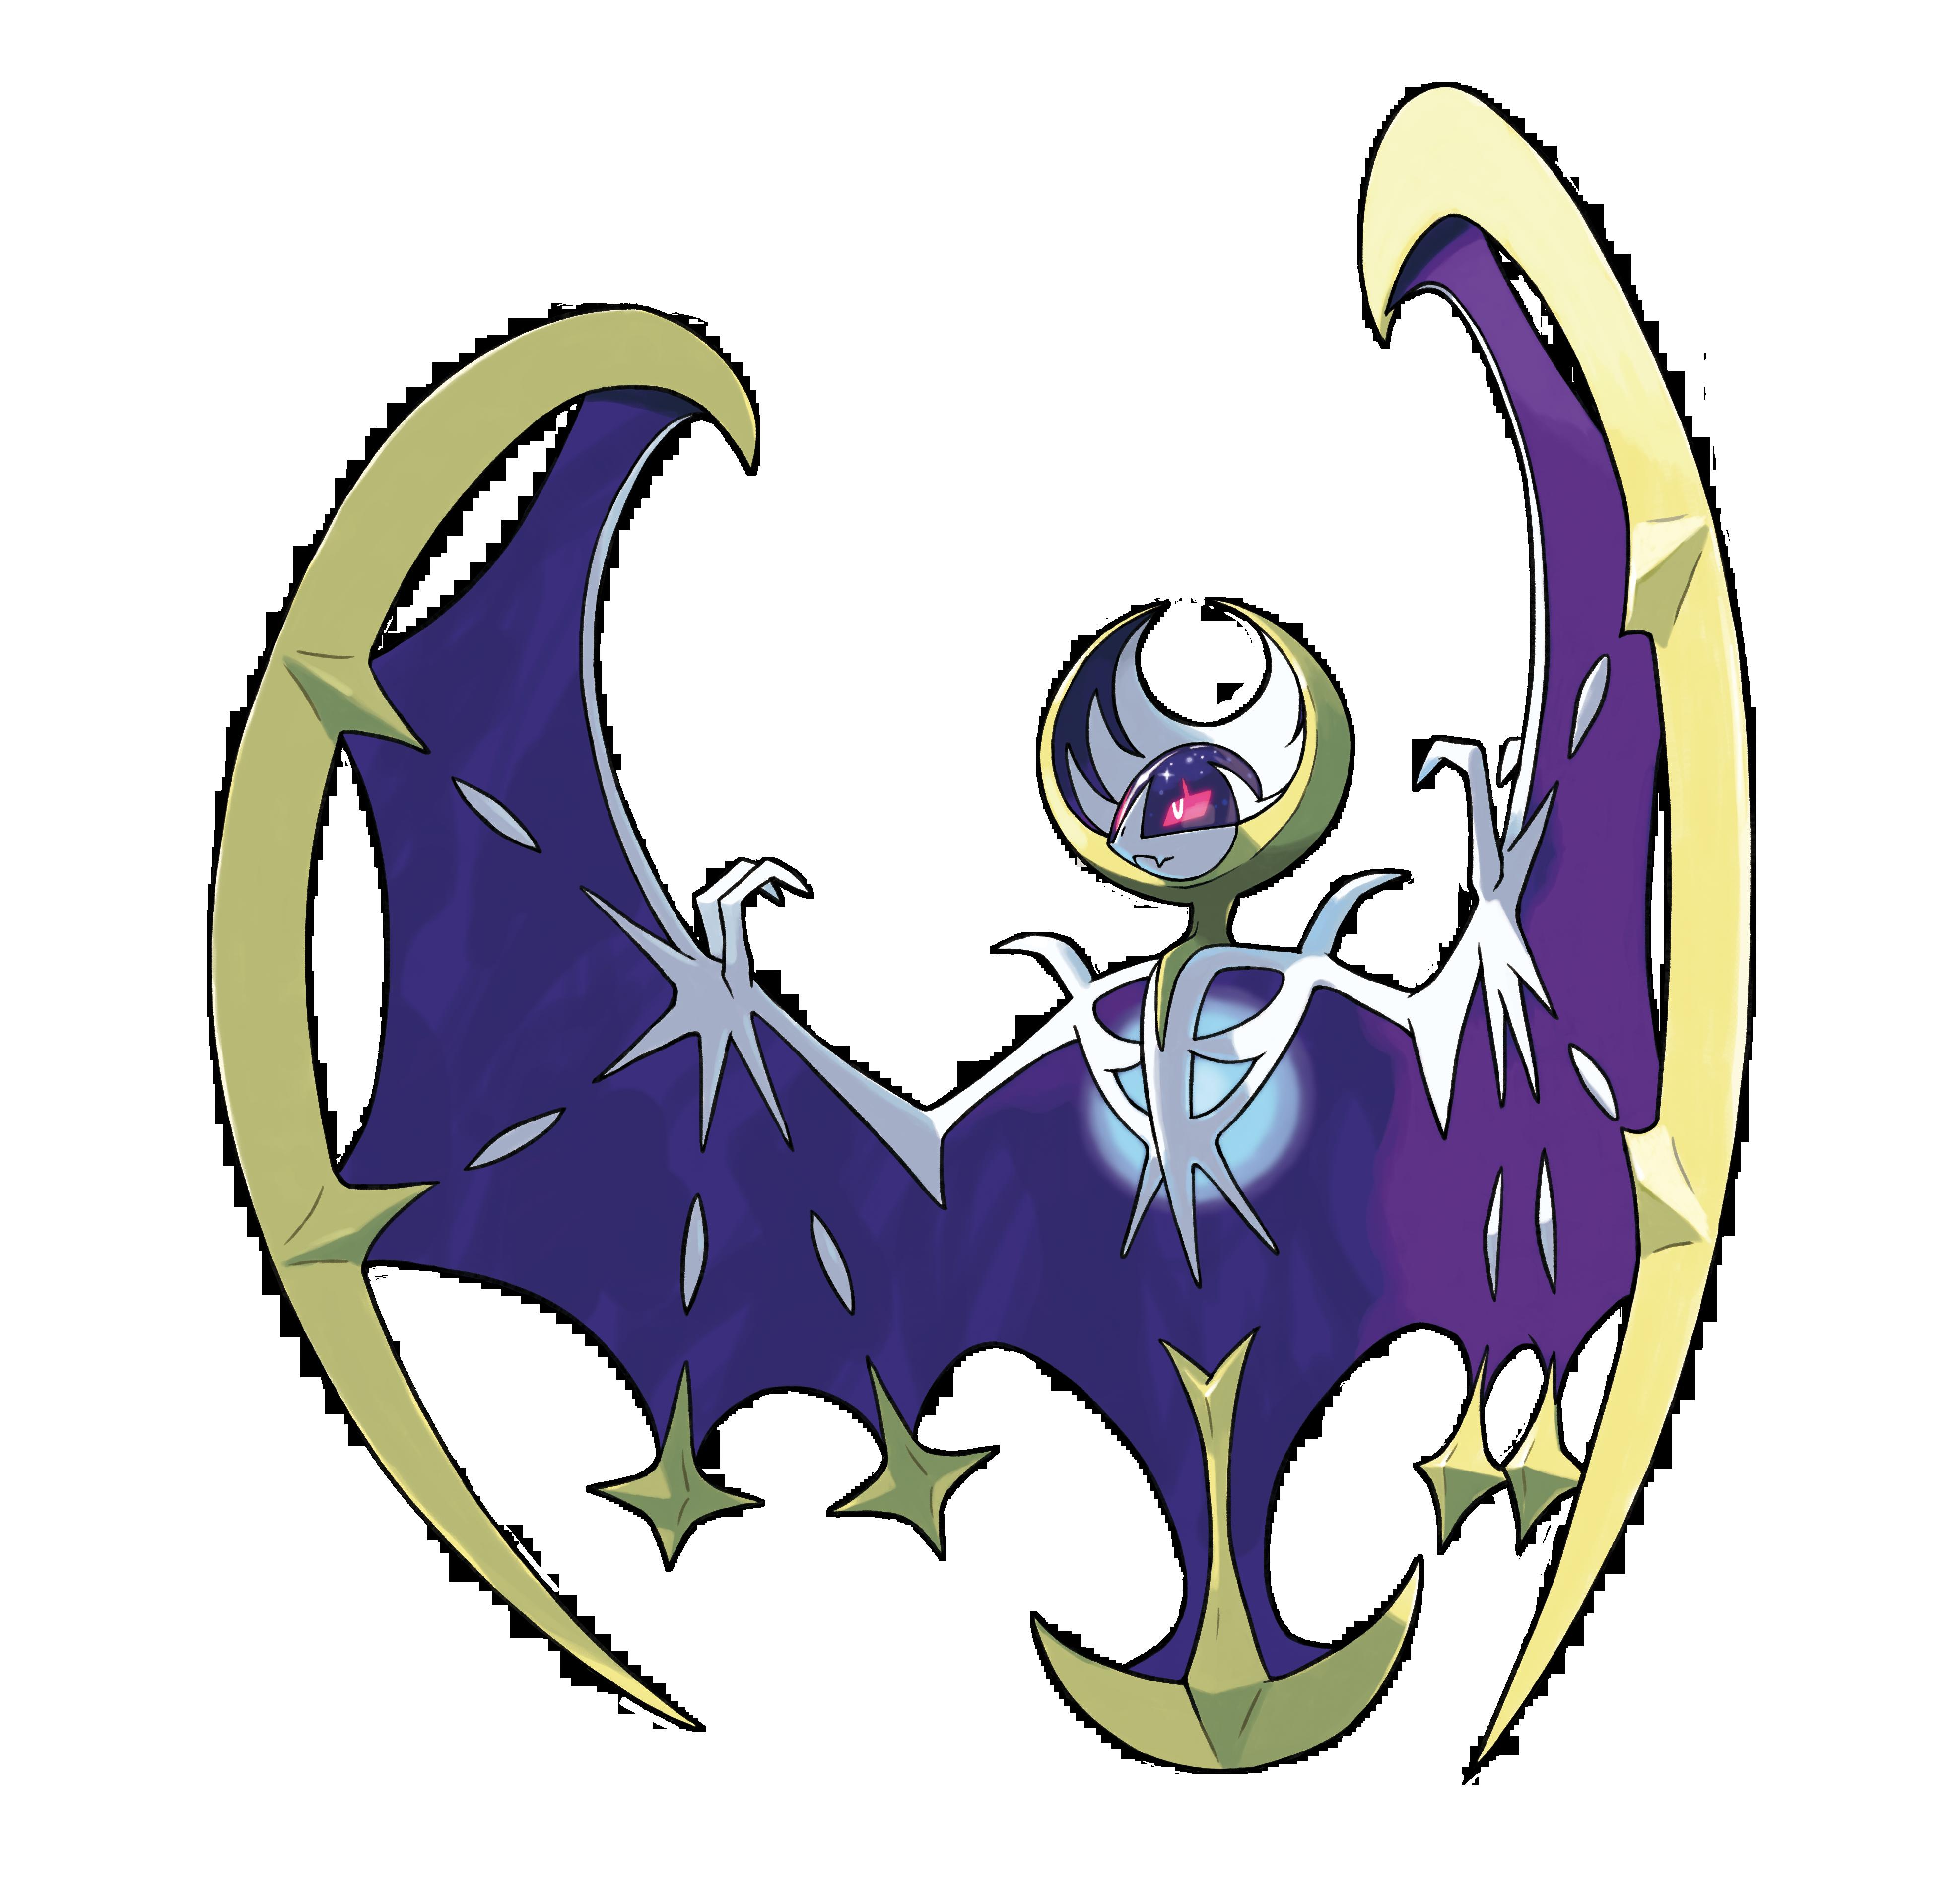 Pokémon Sun and Pokémon Moon (ポケットモンスター サン・ムーン